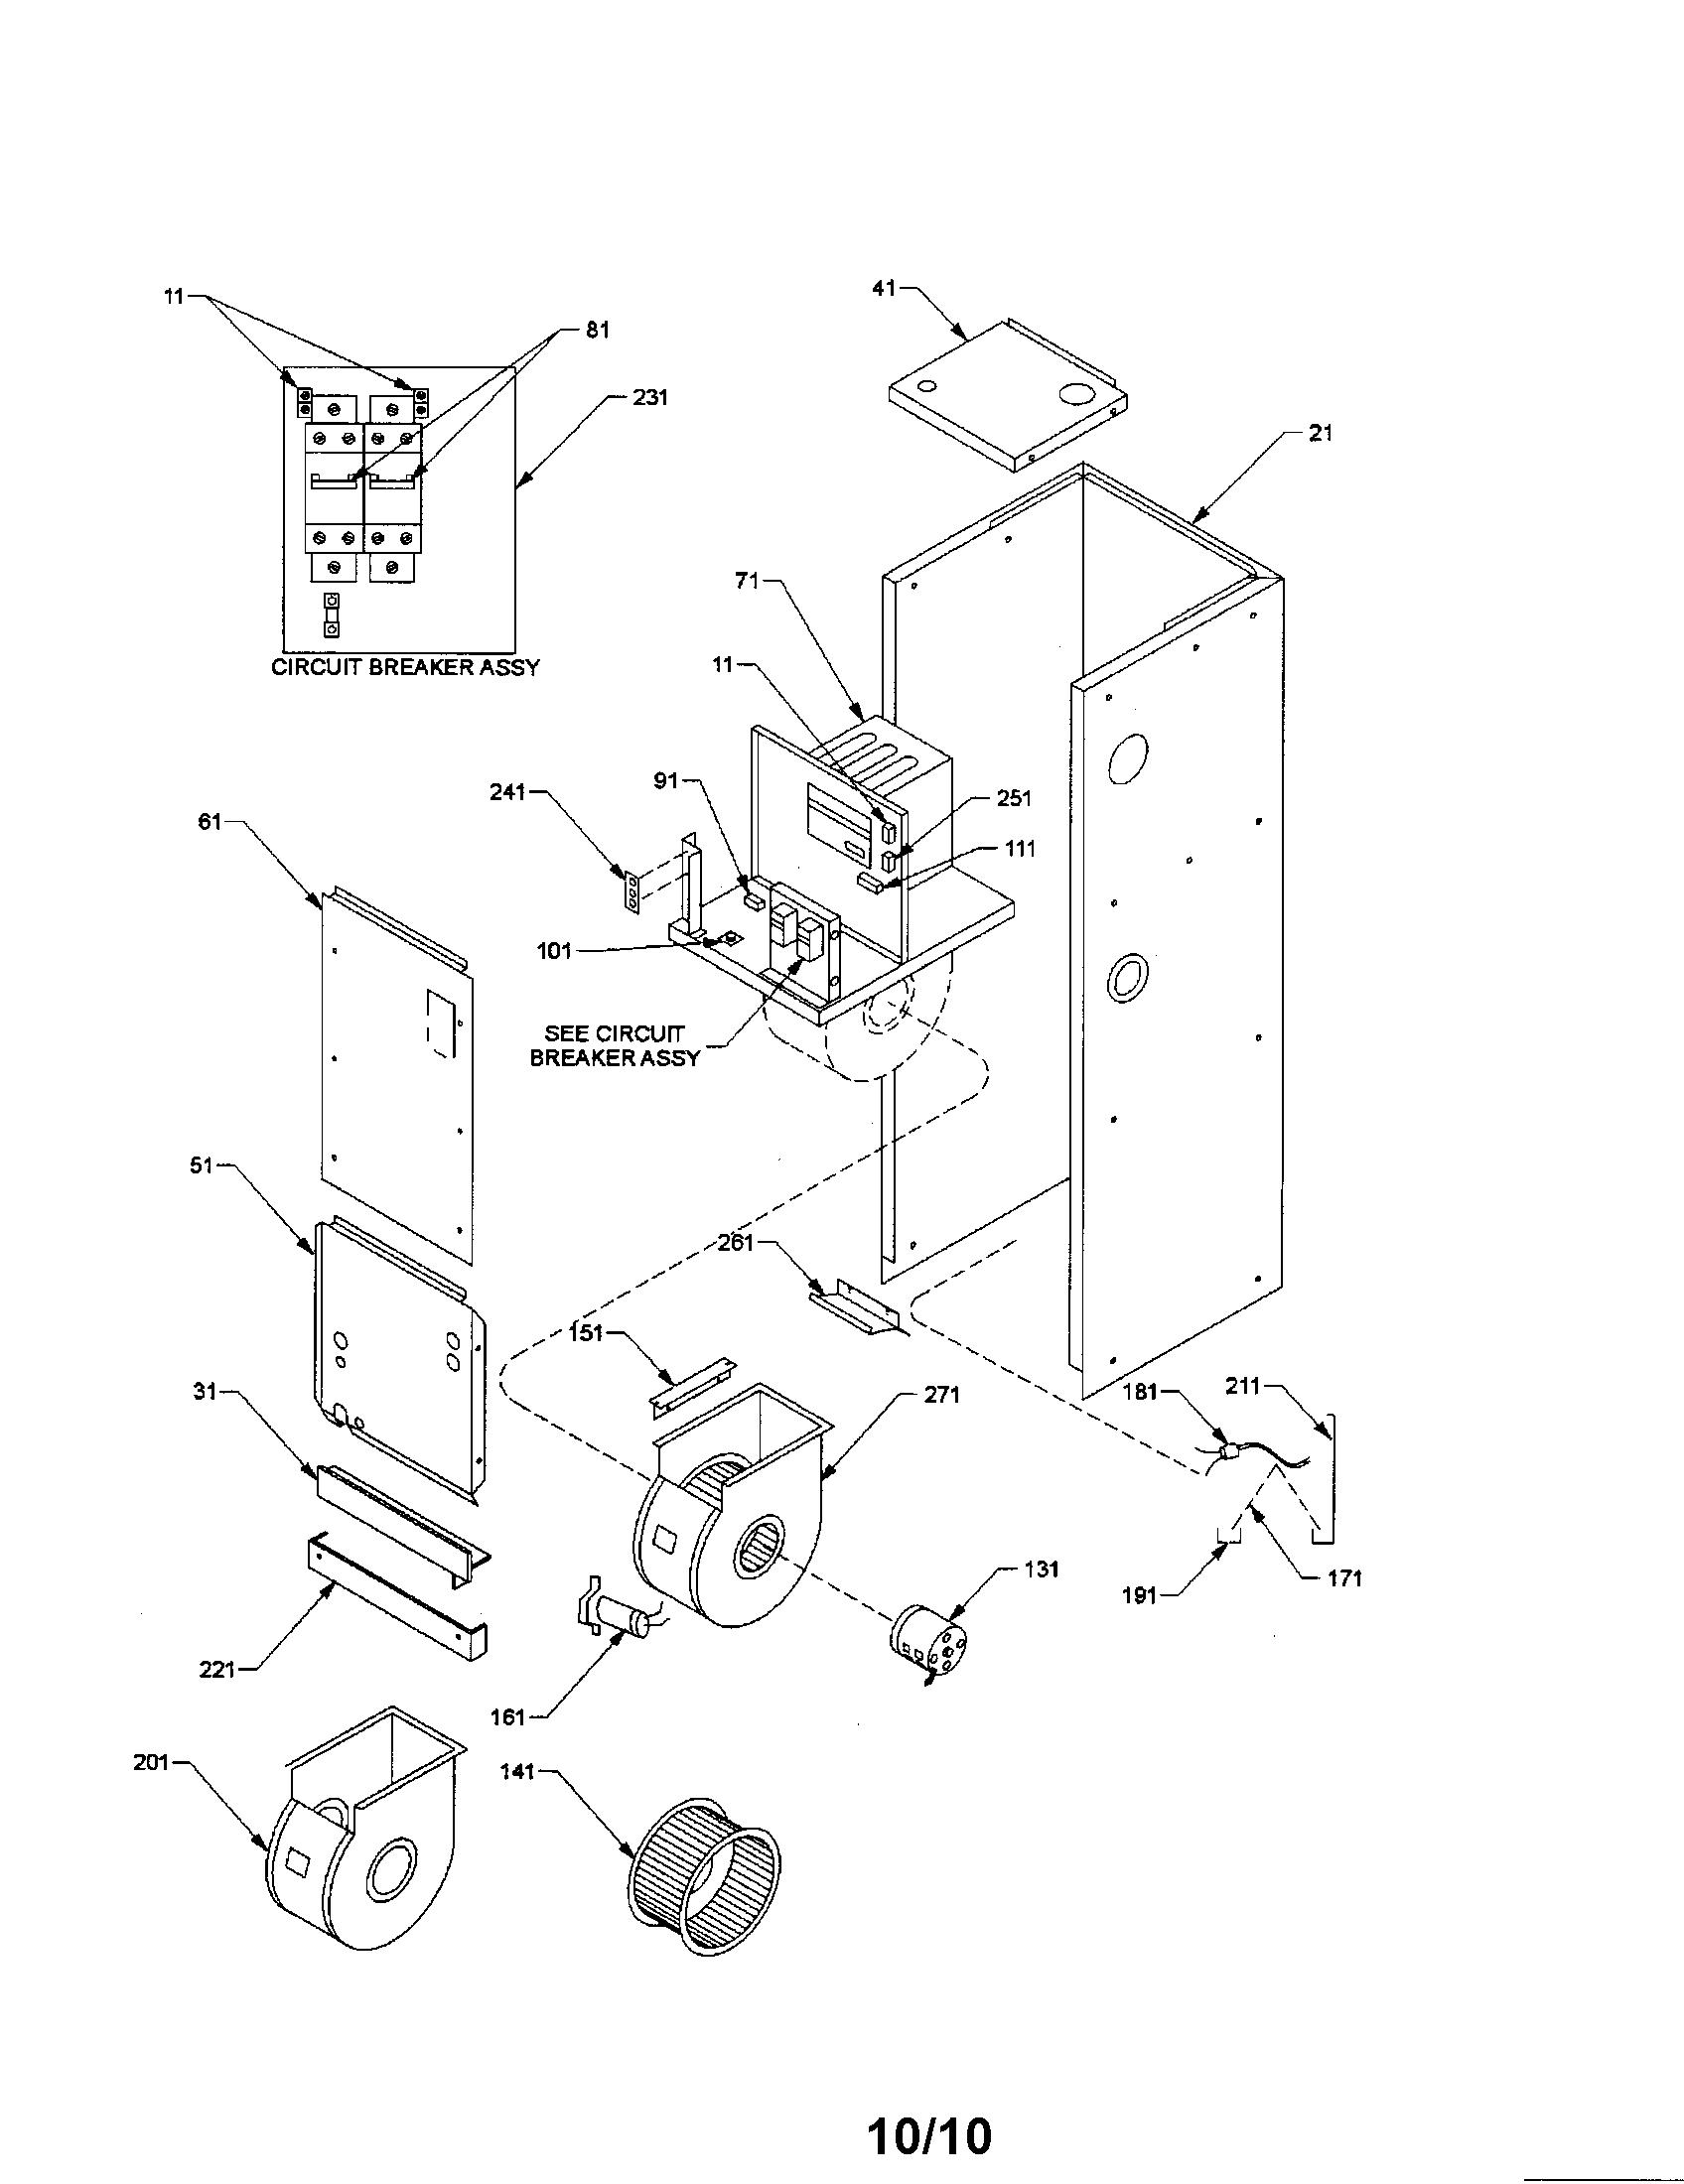 Janitrol model A32-10 air handler (indoor blower&evap